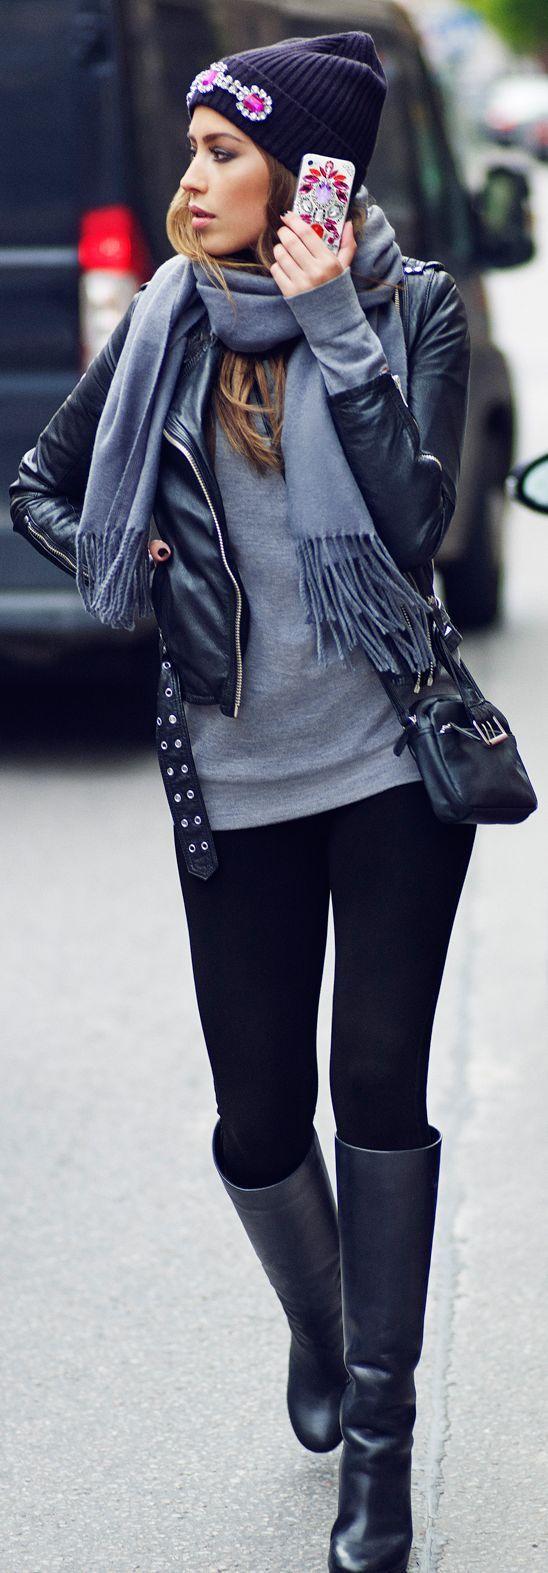 Grey-long-sleeve-shirt-and-black-leggings Grey-long-sleeve-shirt-and-black-leggings